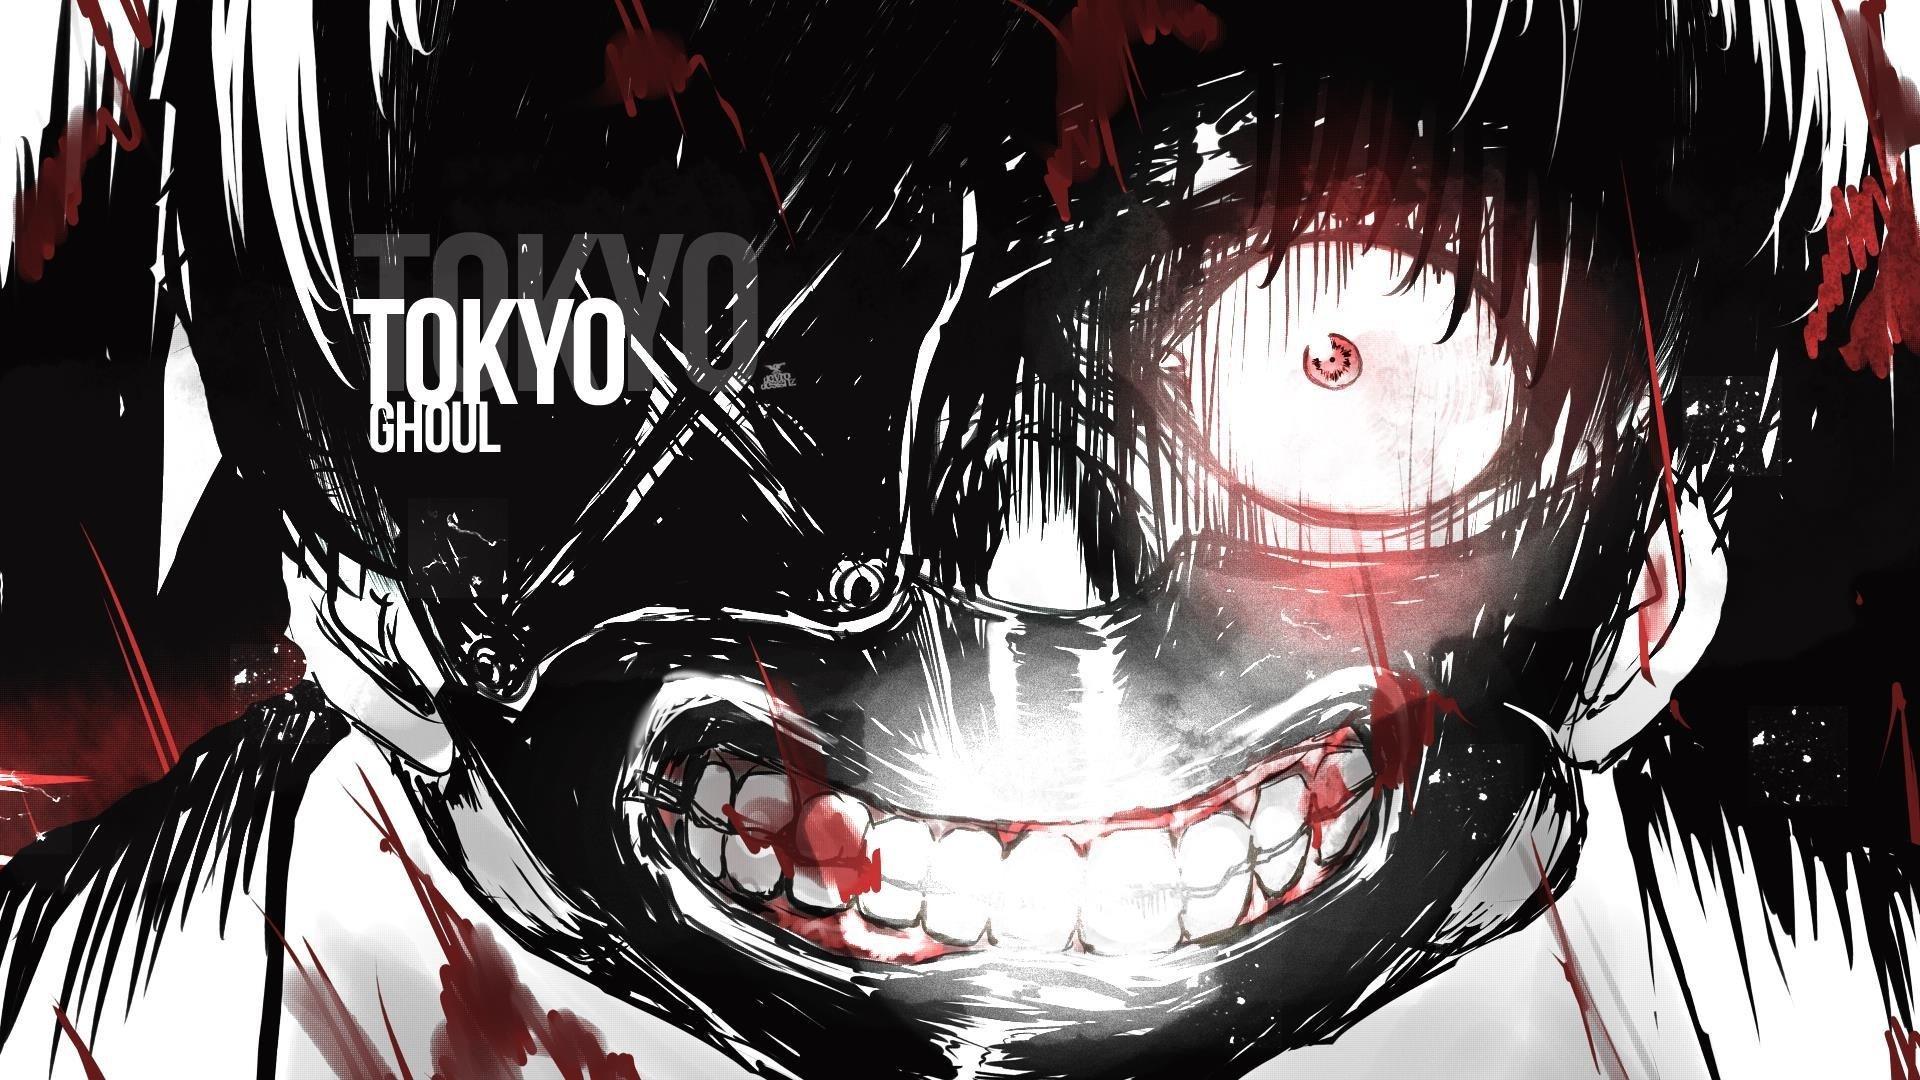 Tokyo Ghoul Full HD Fond d'écran and Arrière-Plan | 1920x1080 | ID:596600